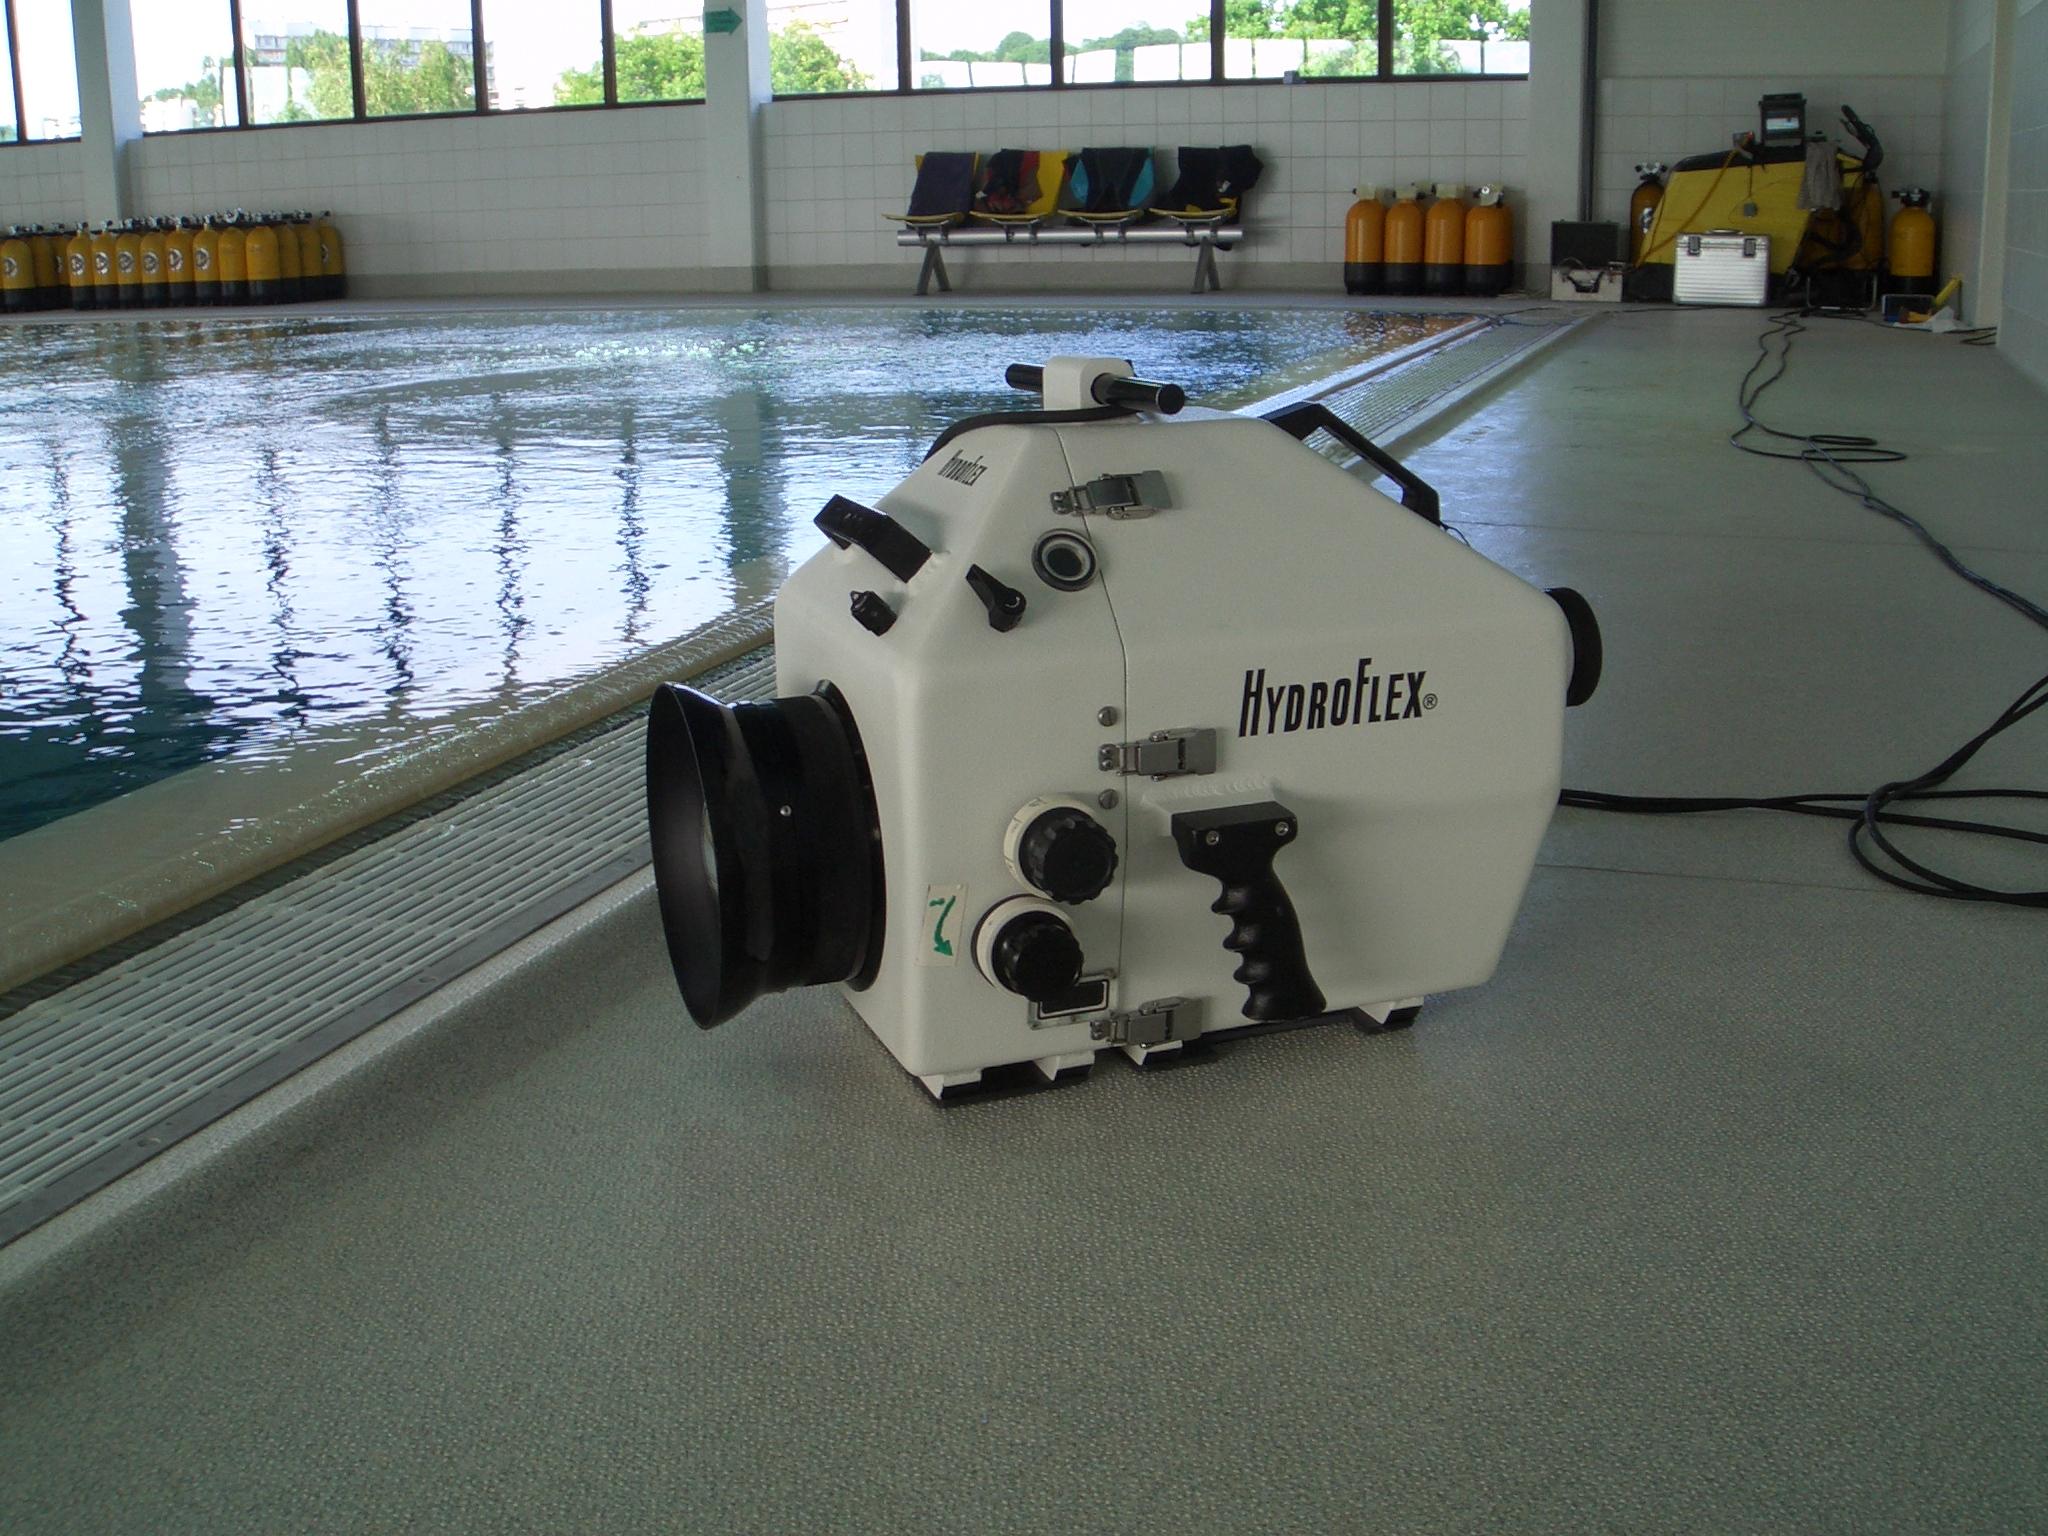 Hydroflex DeepWater 435DW